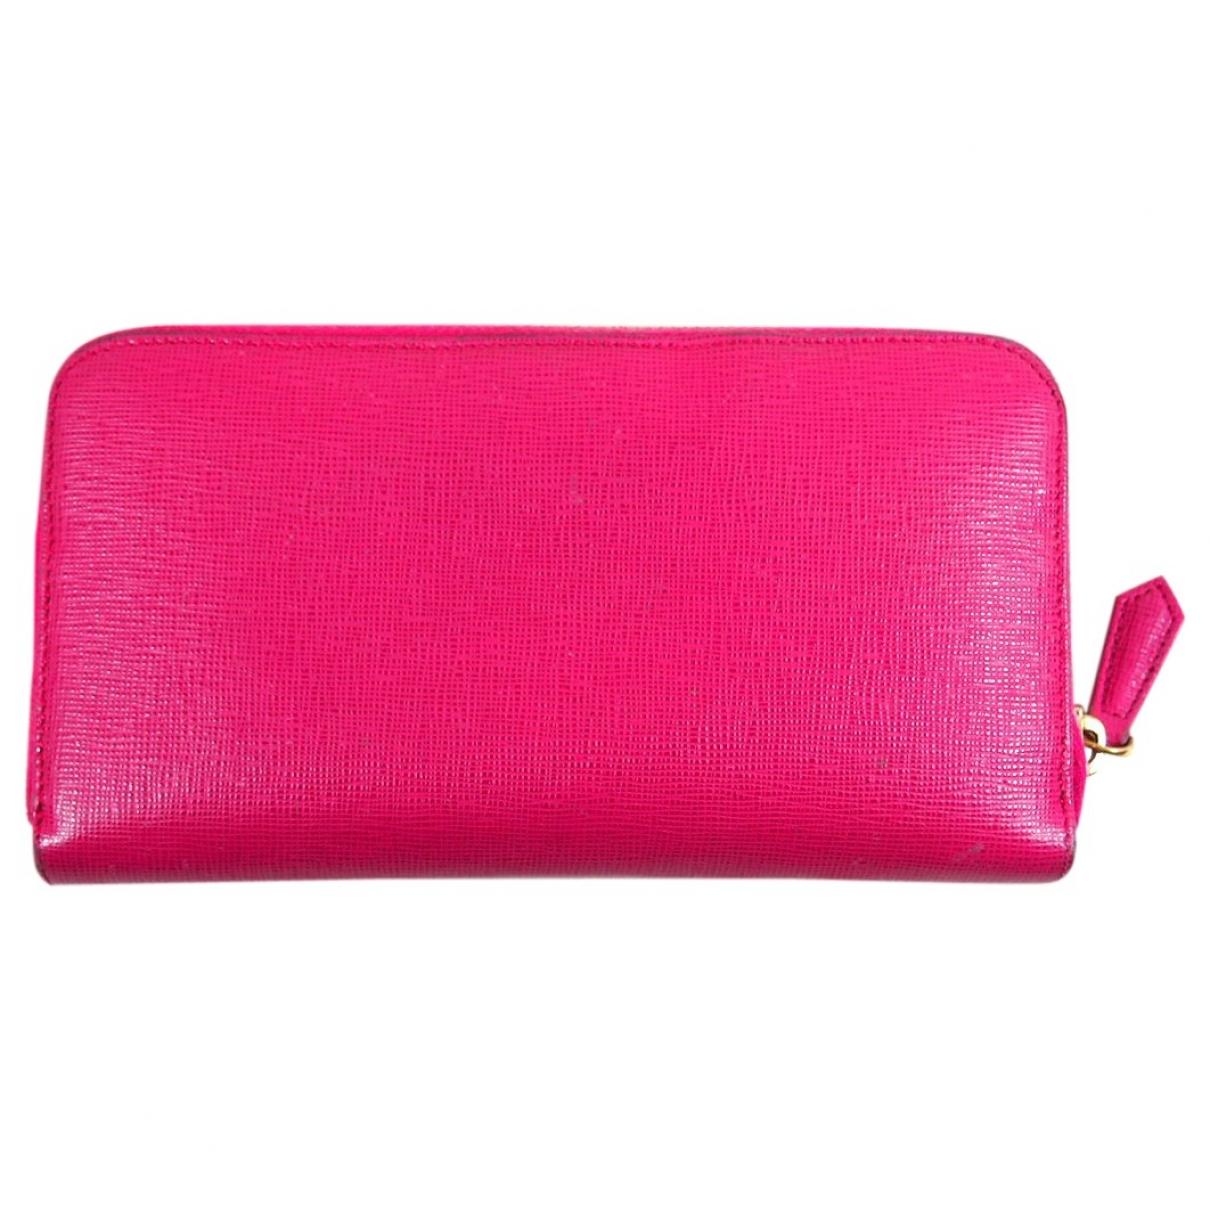 Fendi \N Pink Leather wallet for Women \N